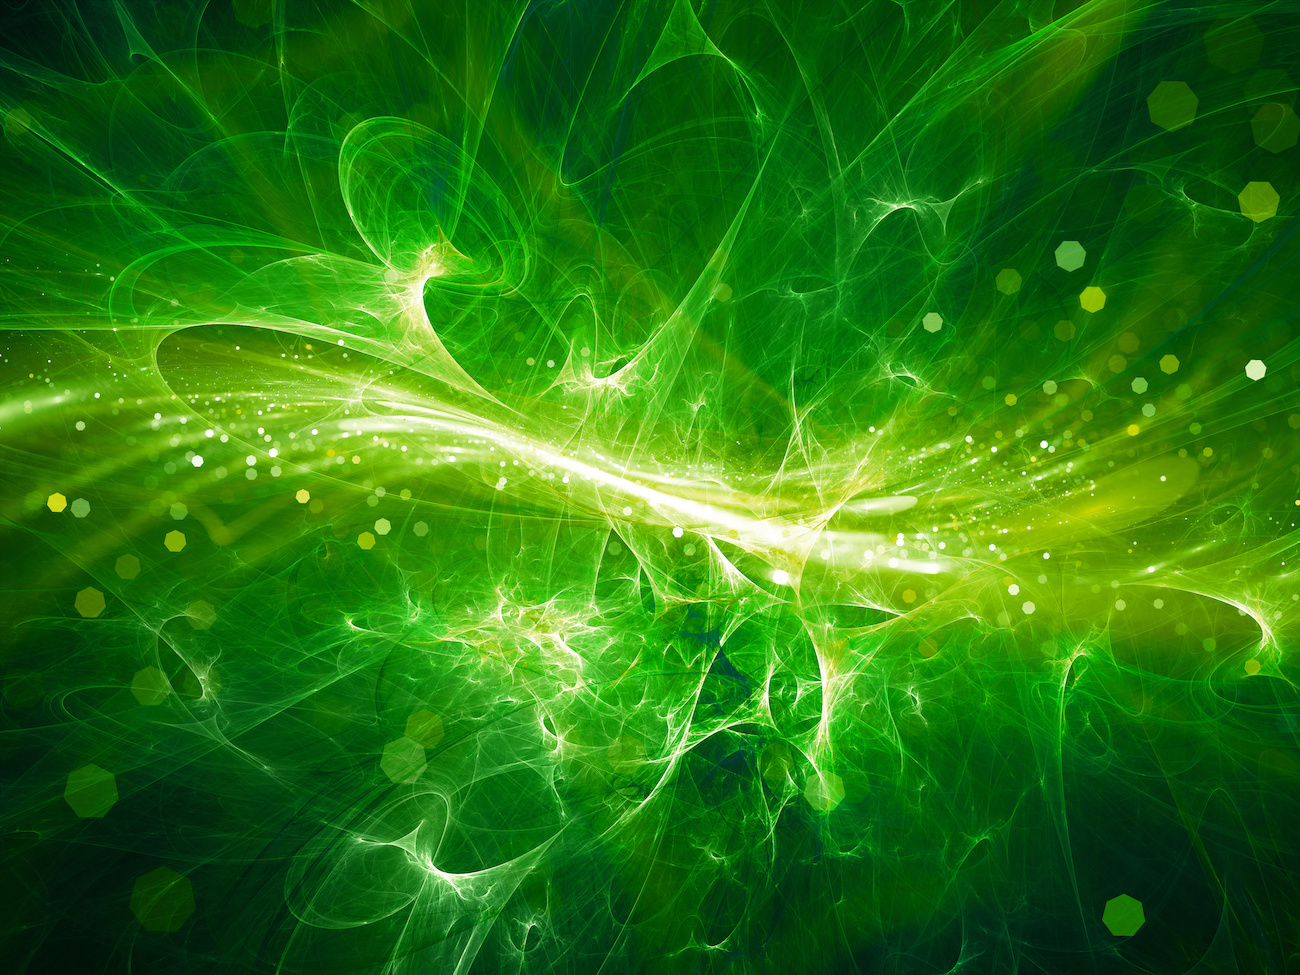 Neutrinovoltaic: Neutrino Physik liefert grüne Energie